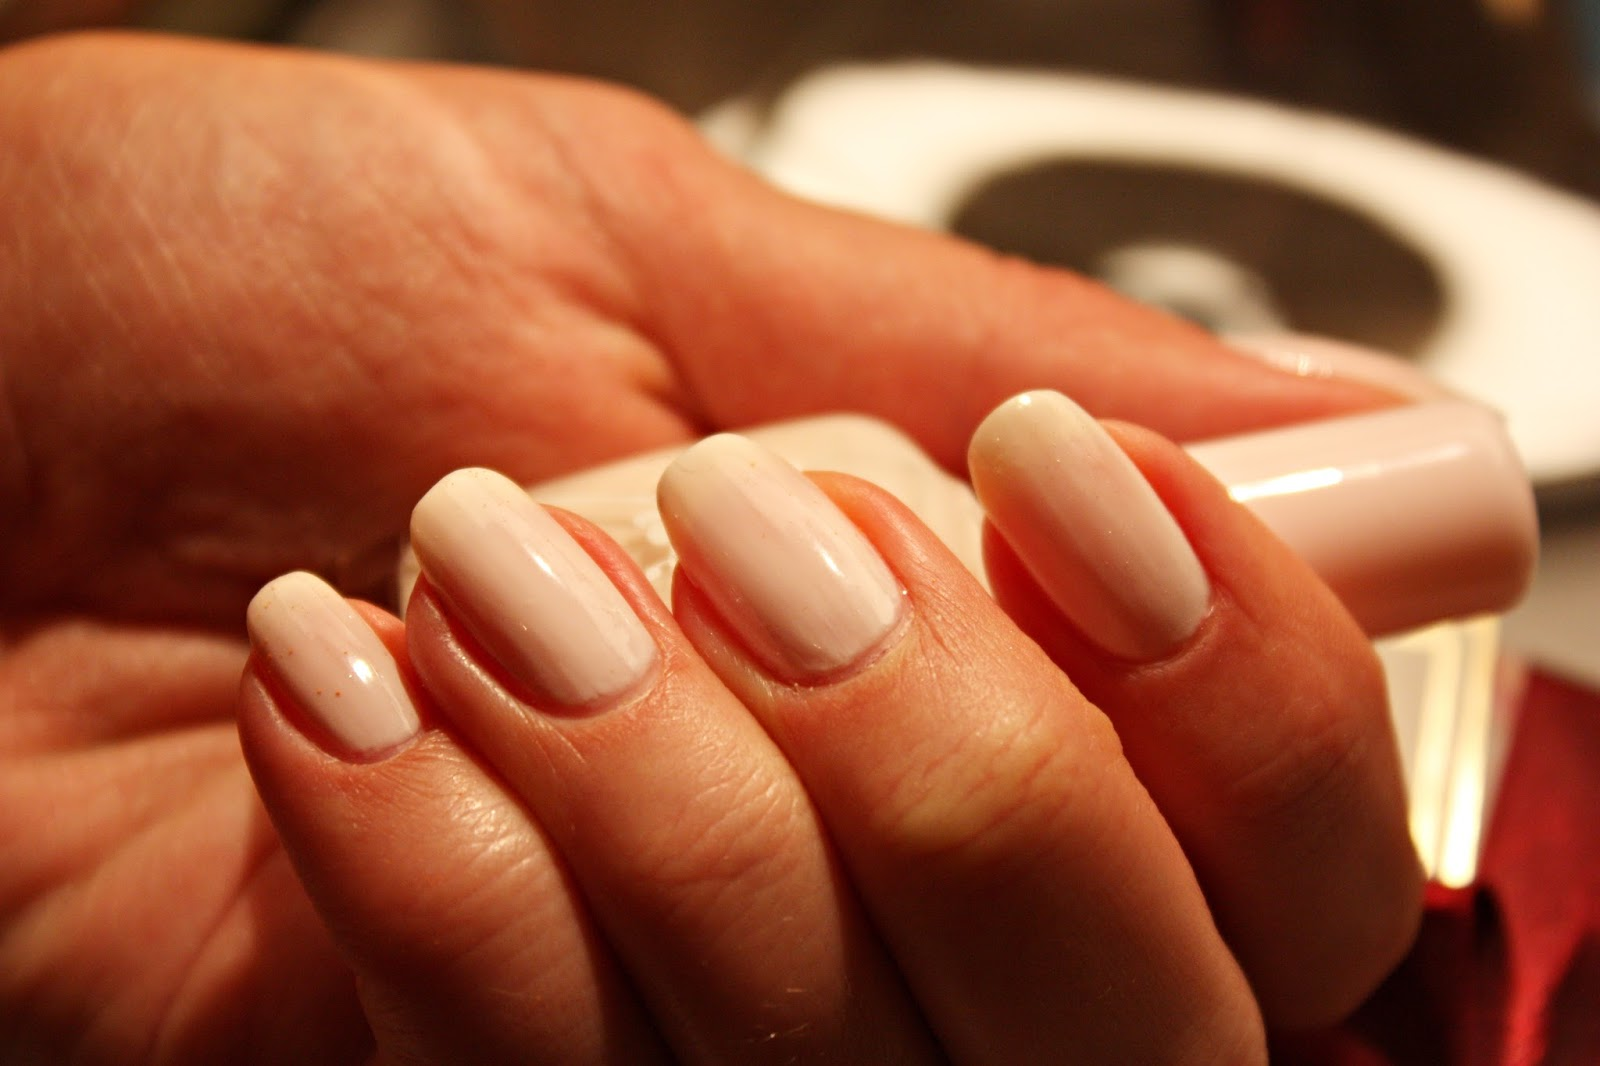 Маникюр на свои ногти